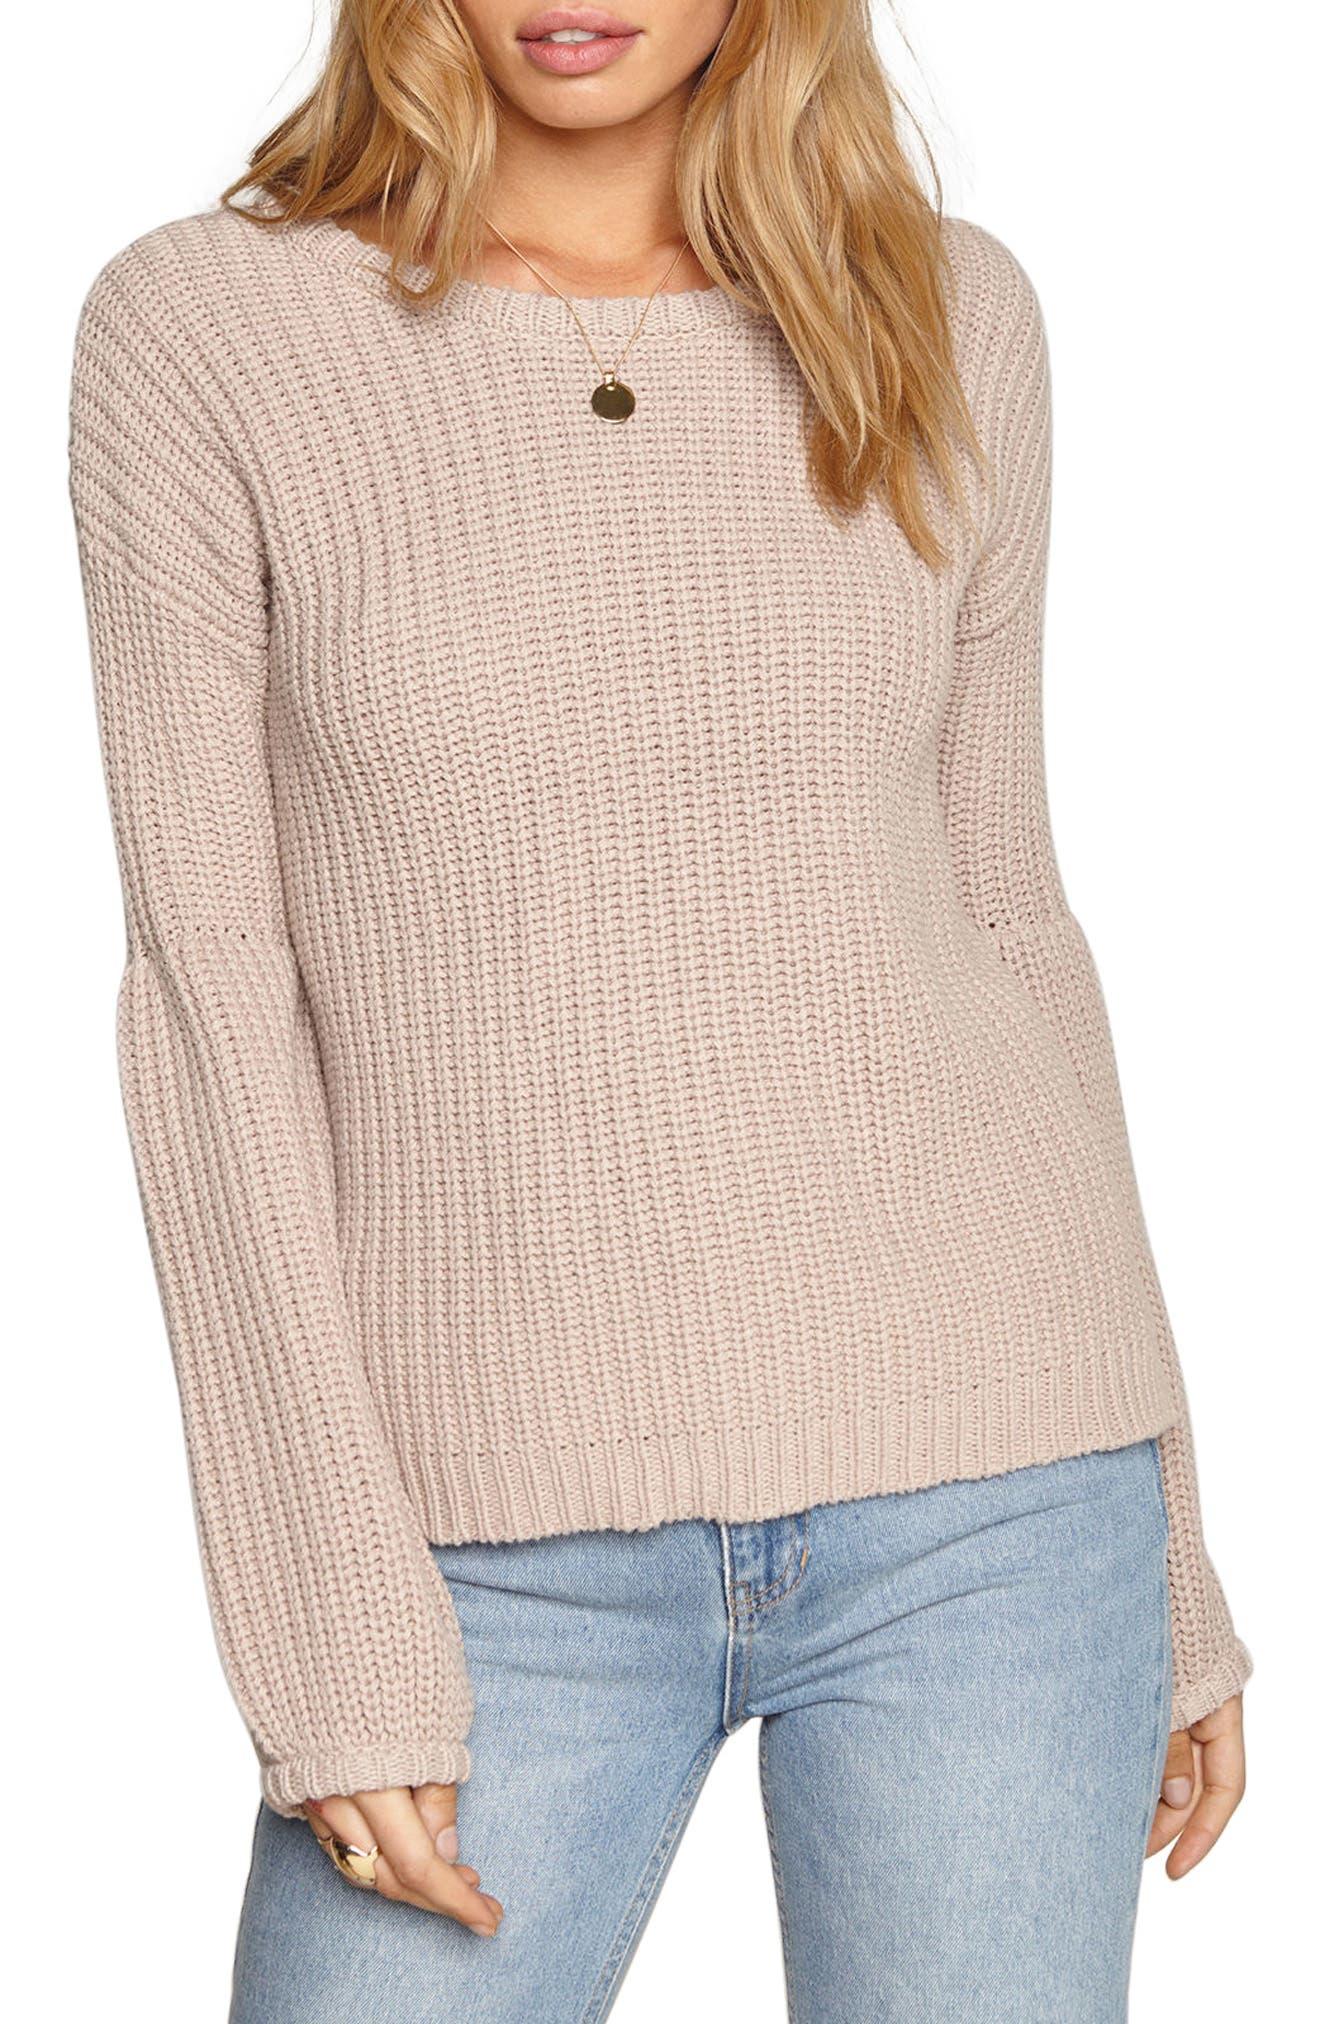 Image of Amuse Society Braxton Sweater